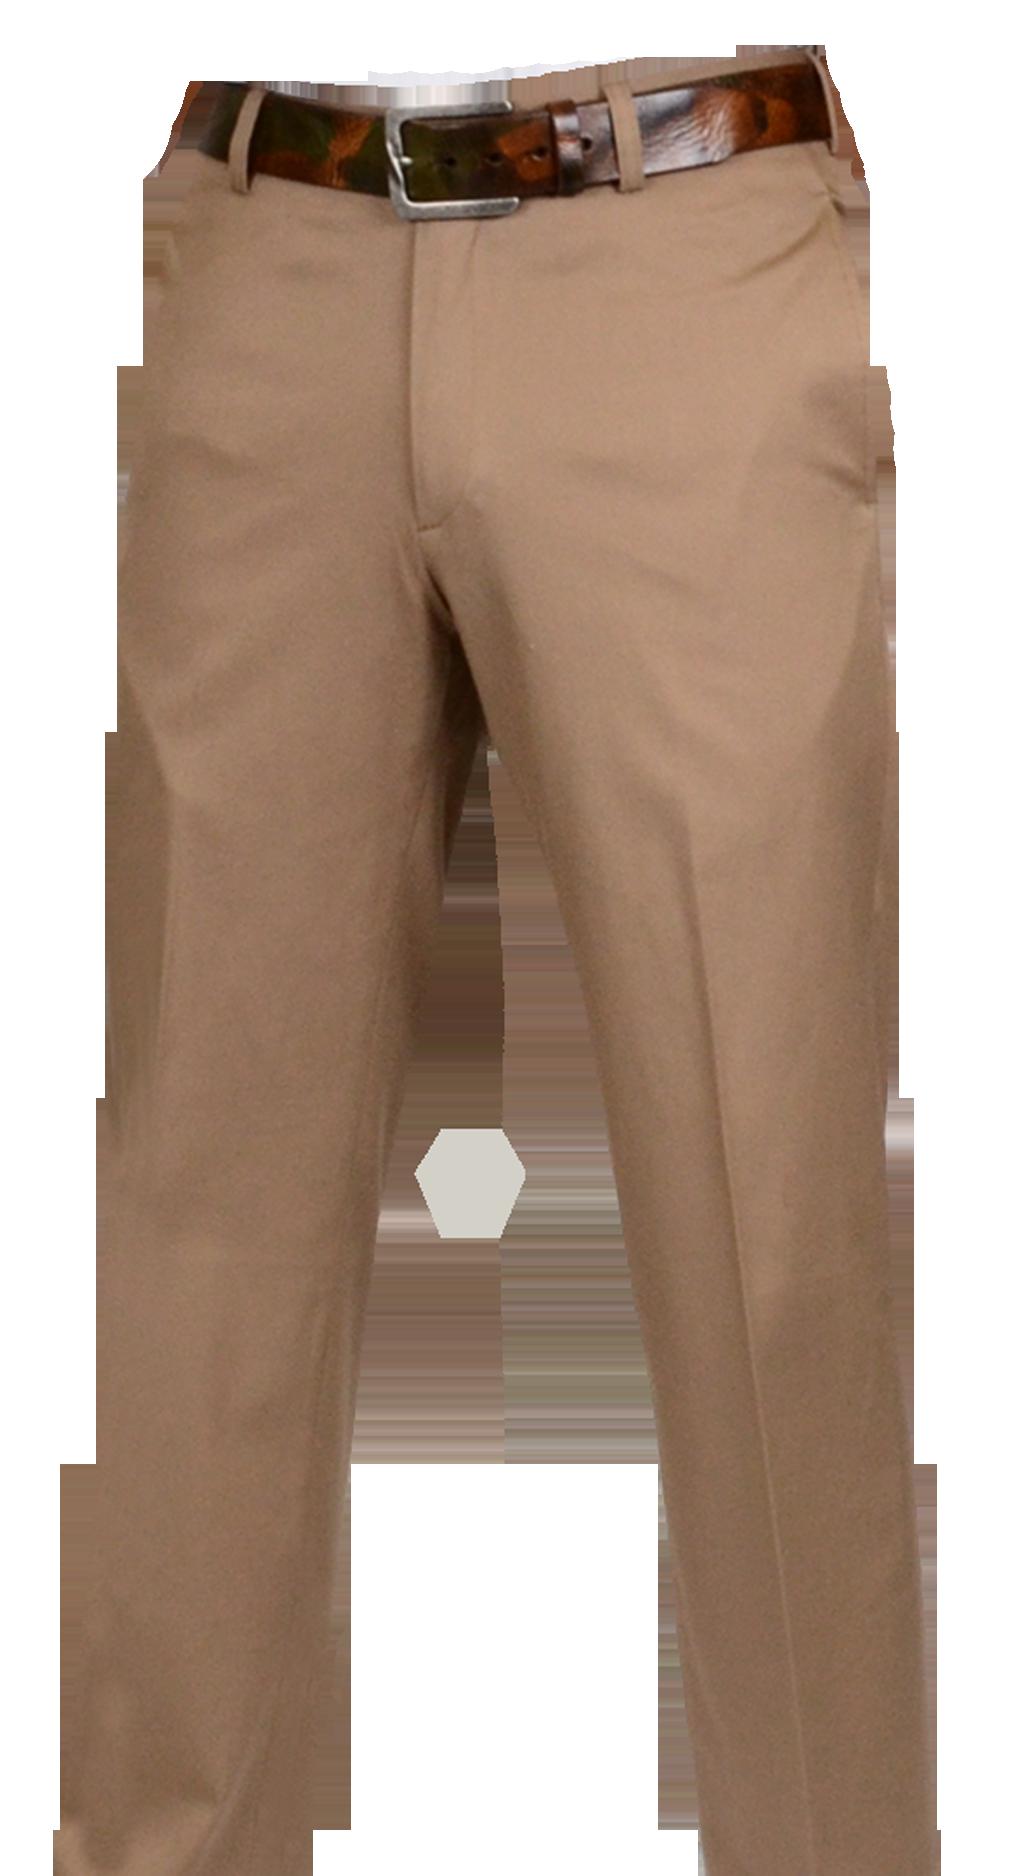 Khaki Pants PNG - 43426